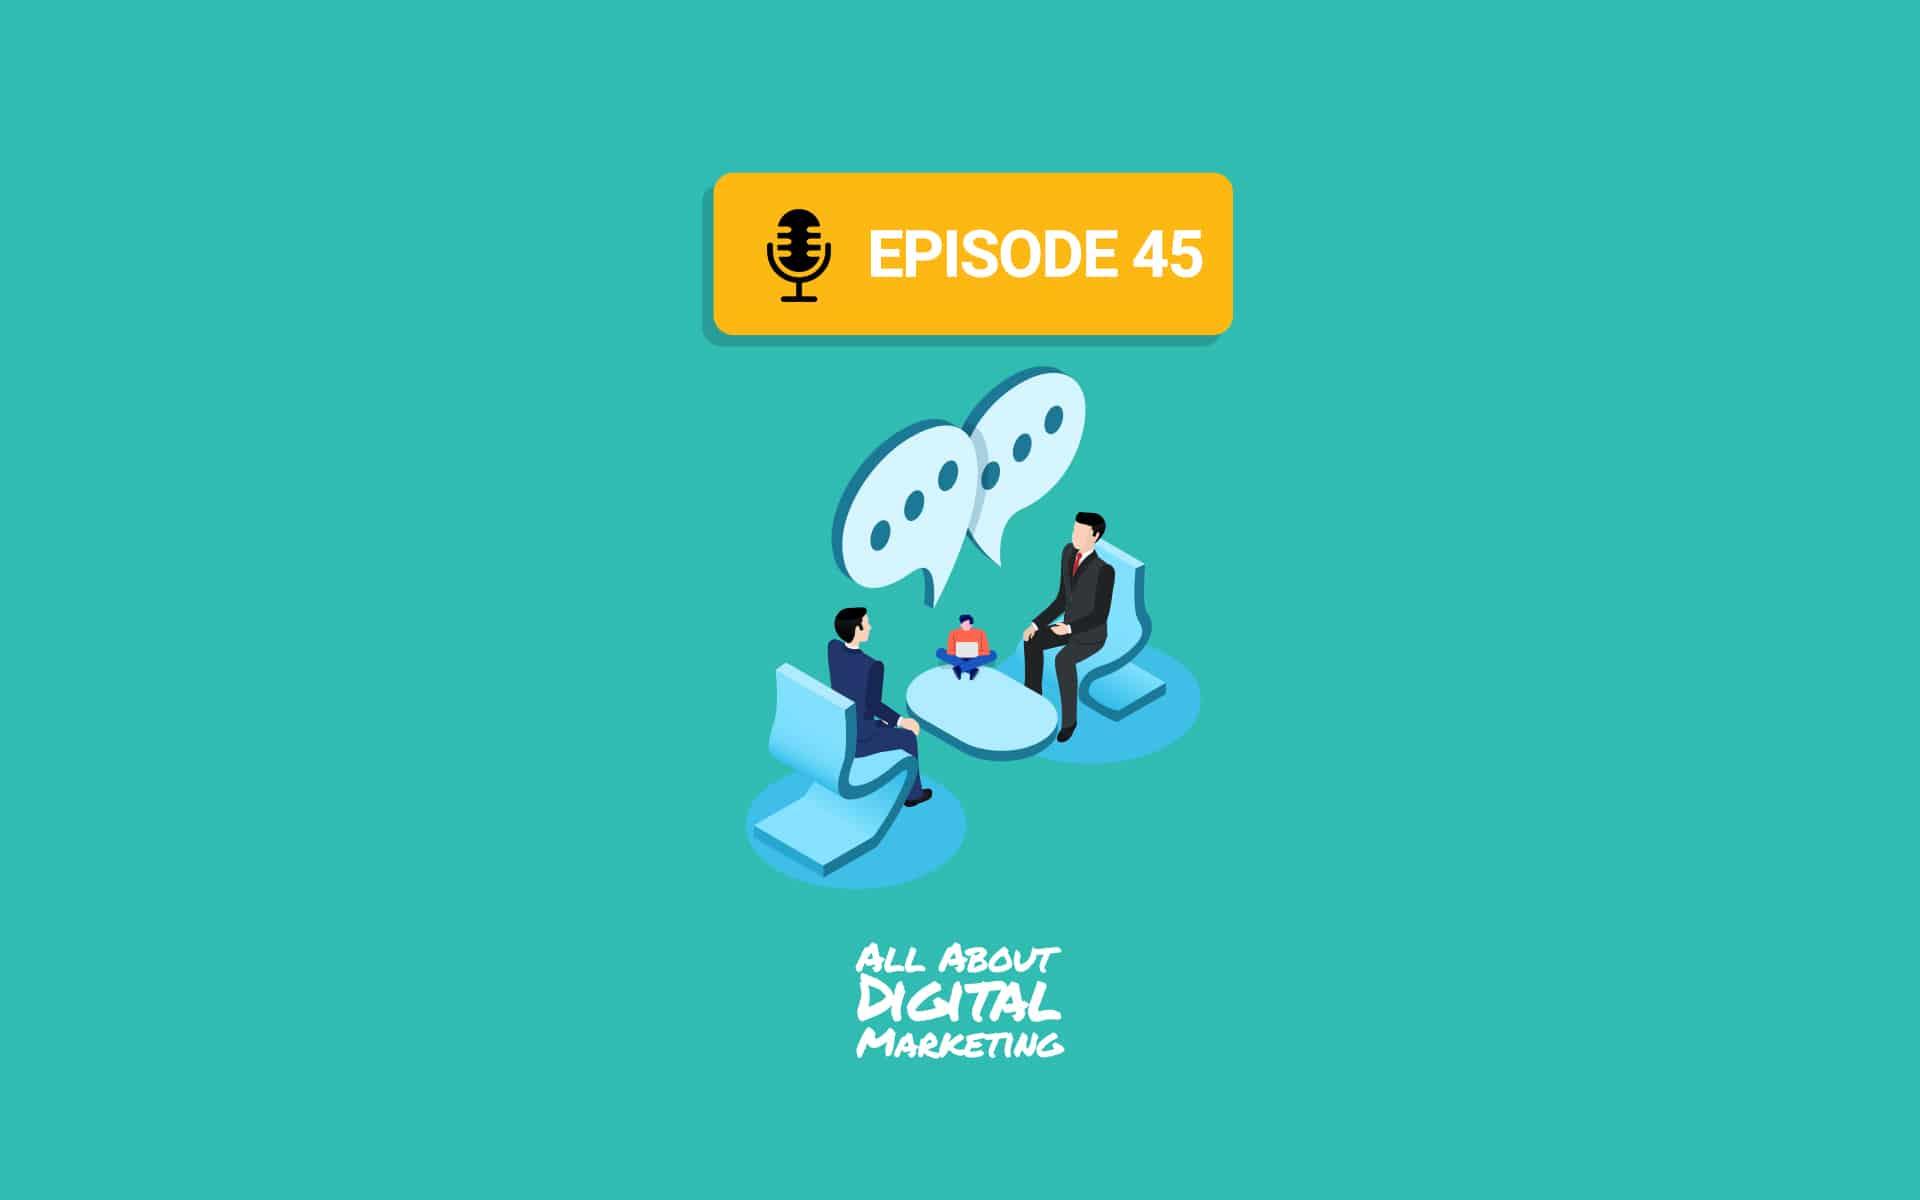 Episode 45 - Communication over sales